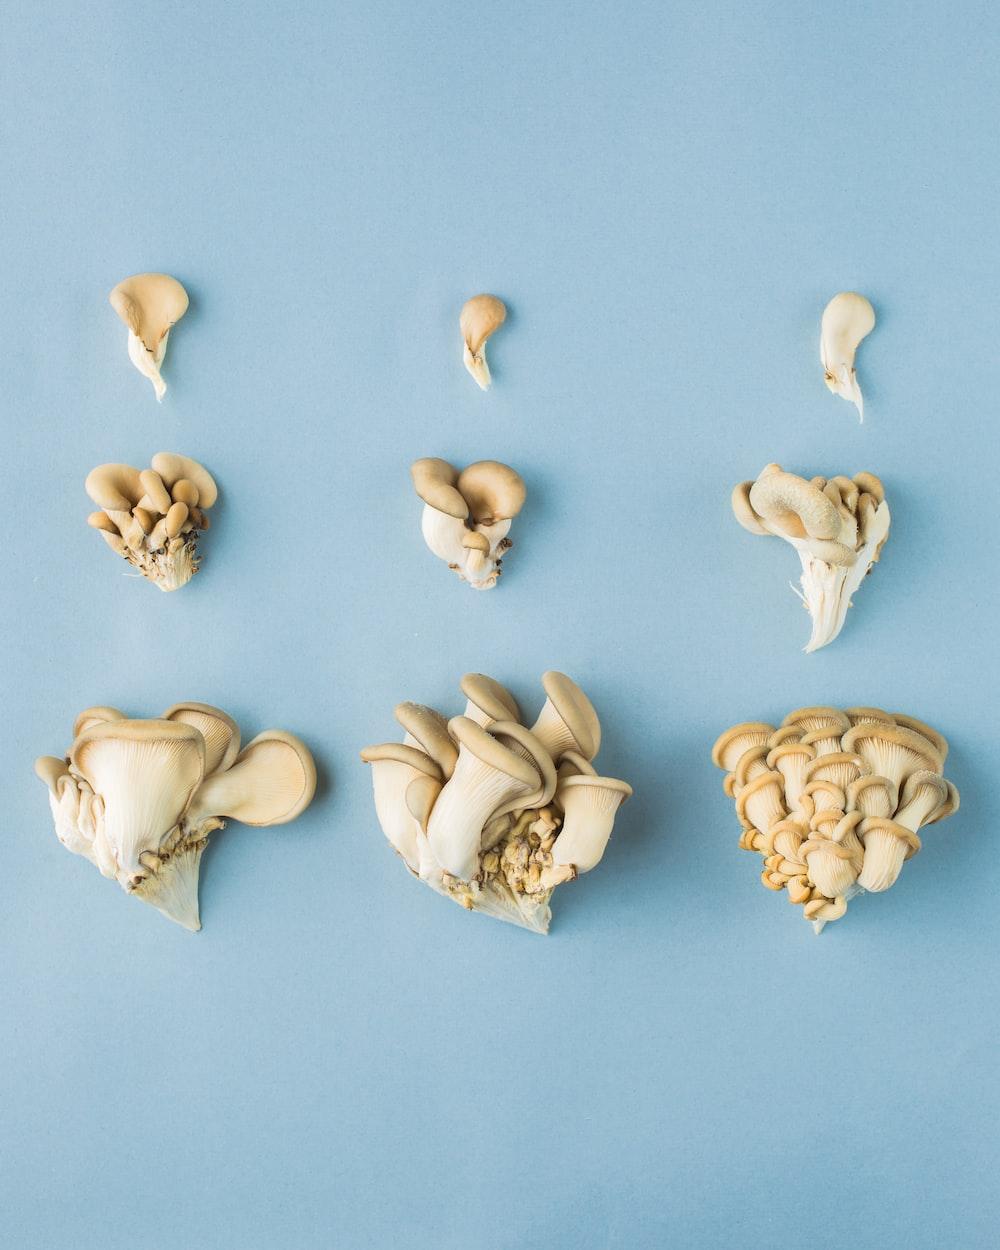 beige mushrooms